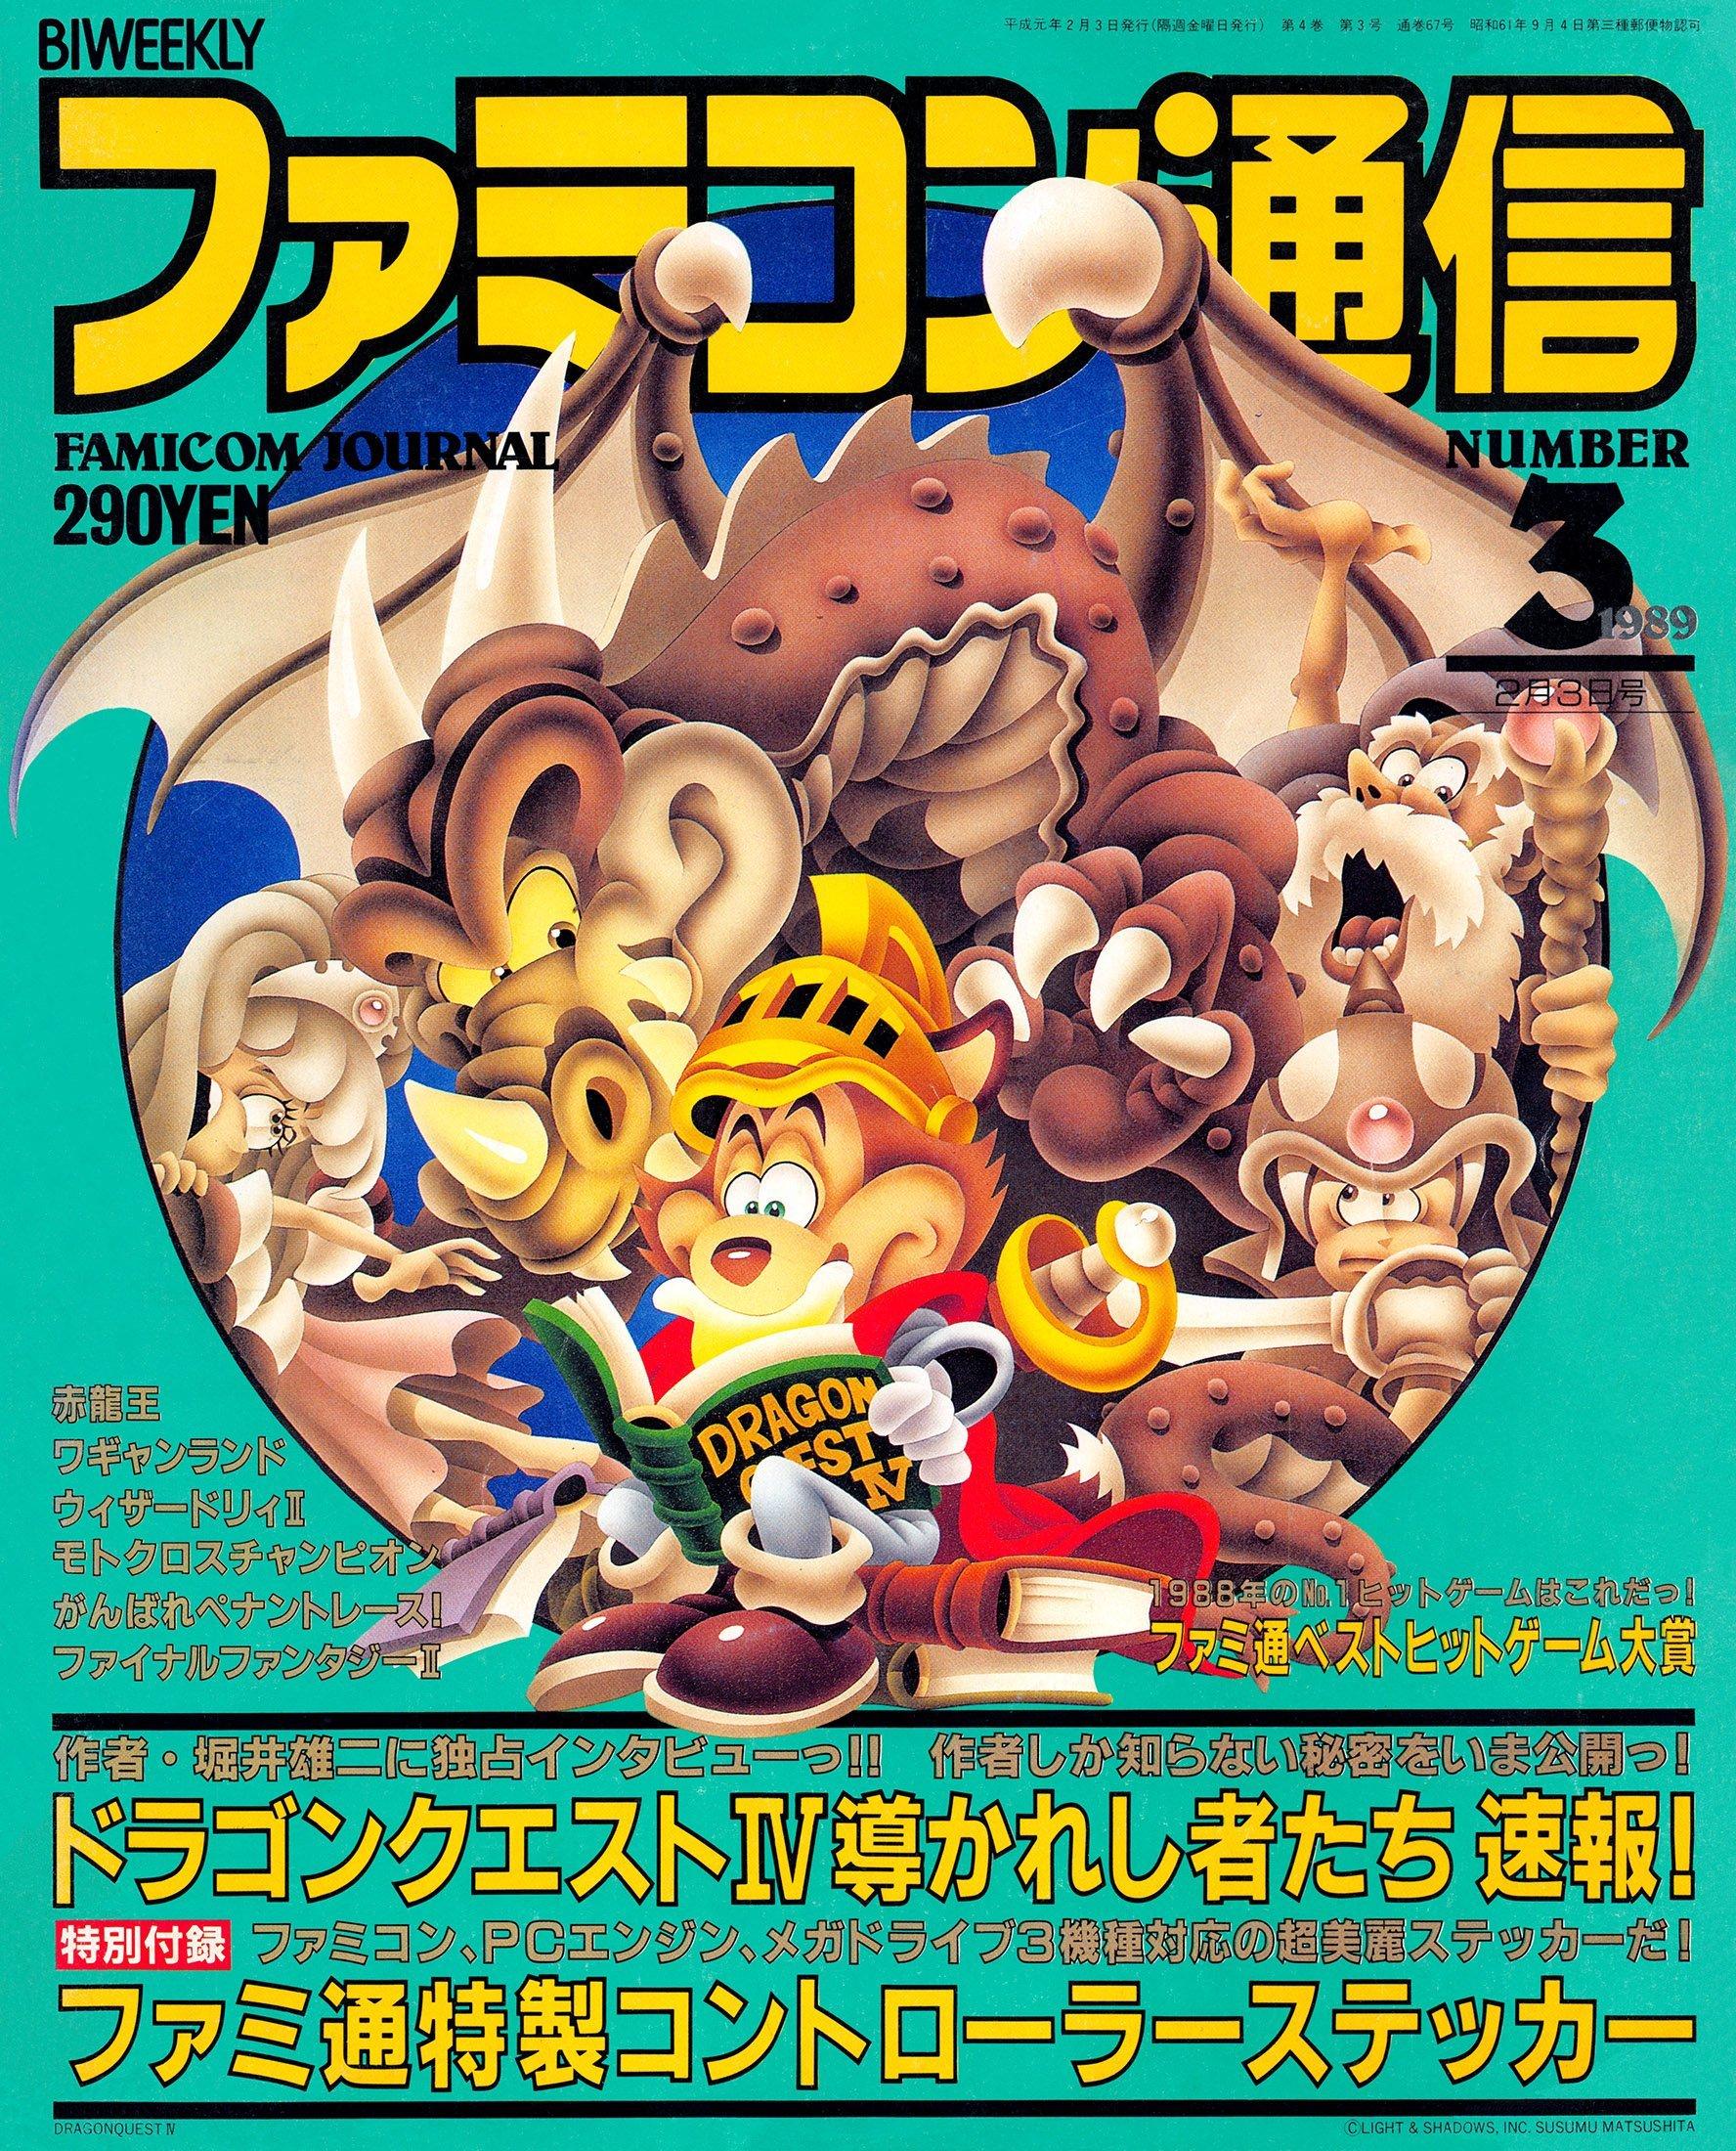 Famitsu 0067 (February 3, 1989)